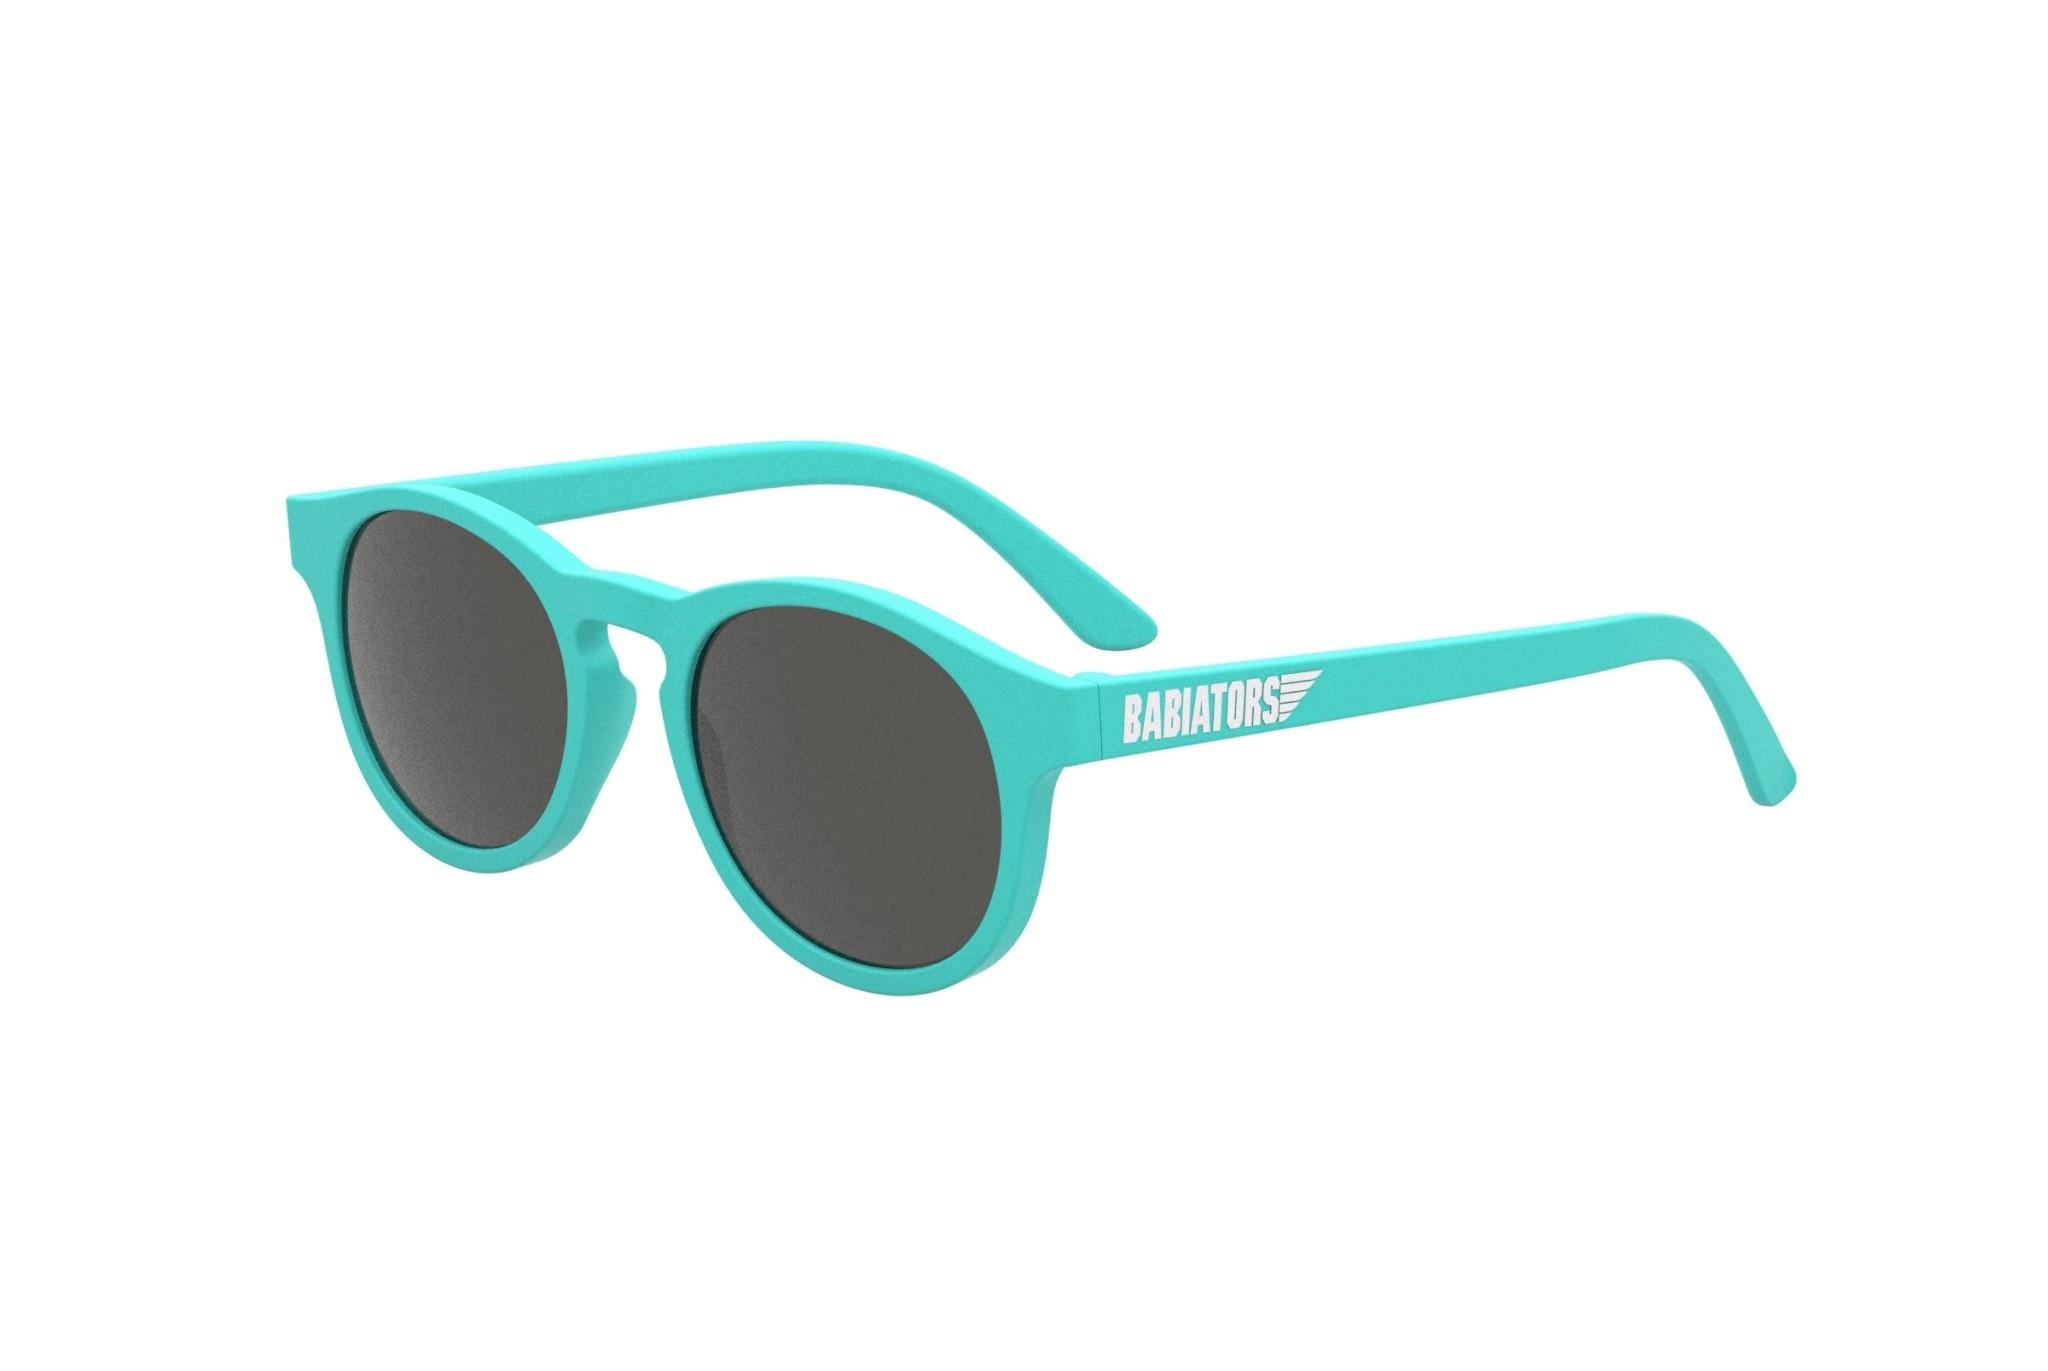 Keyhole Style Sunglasses - Totally Turquoise